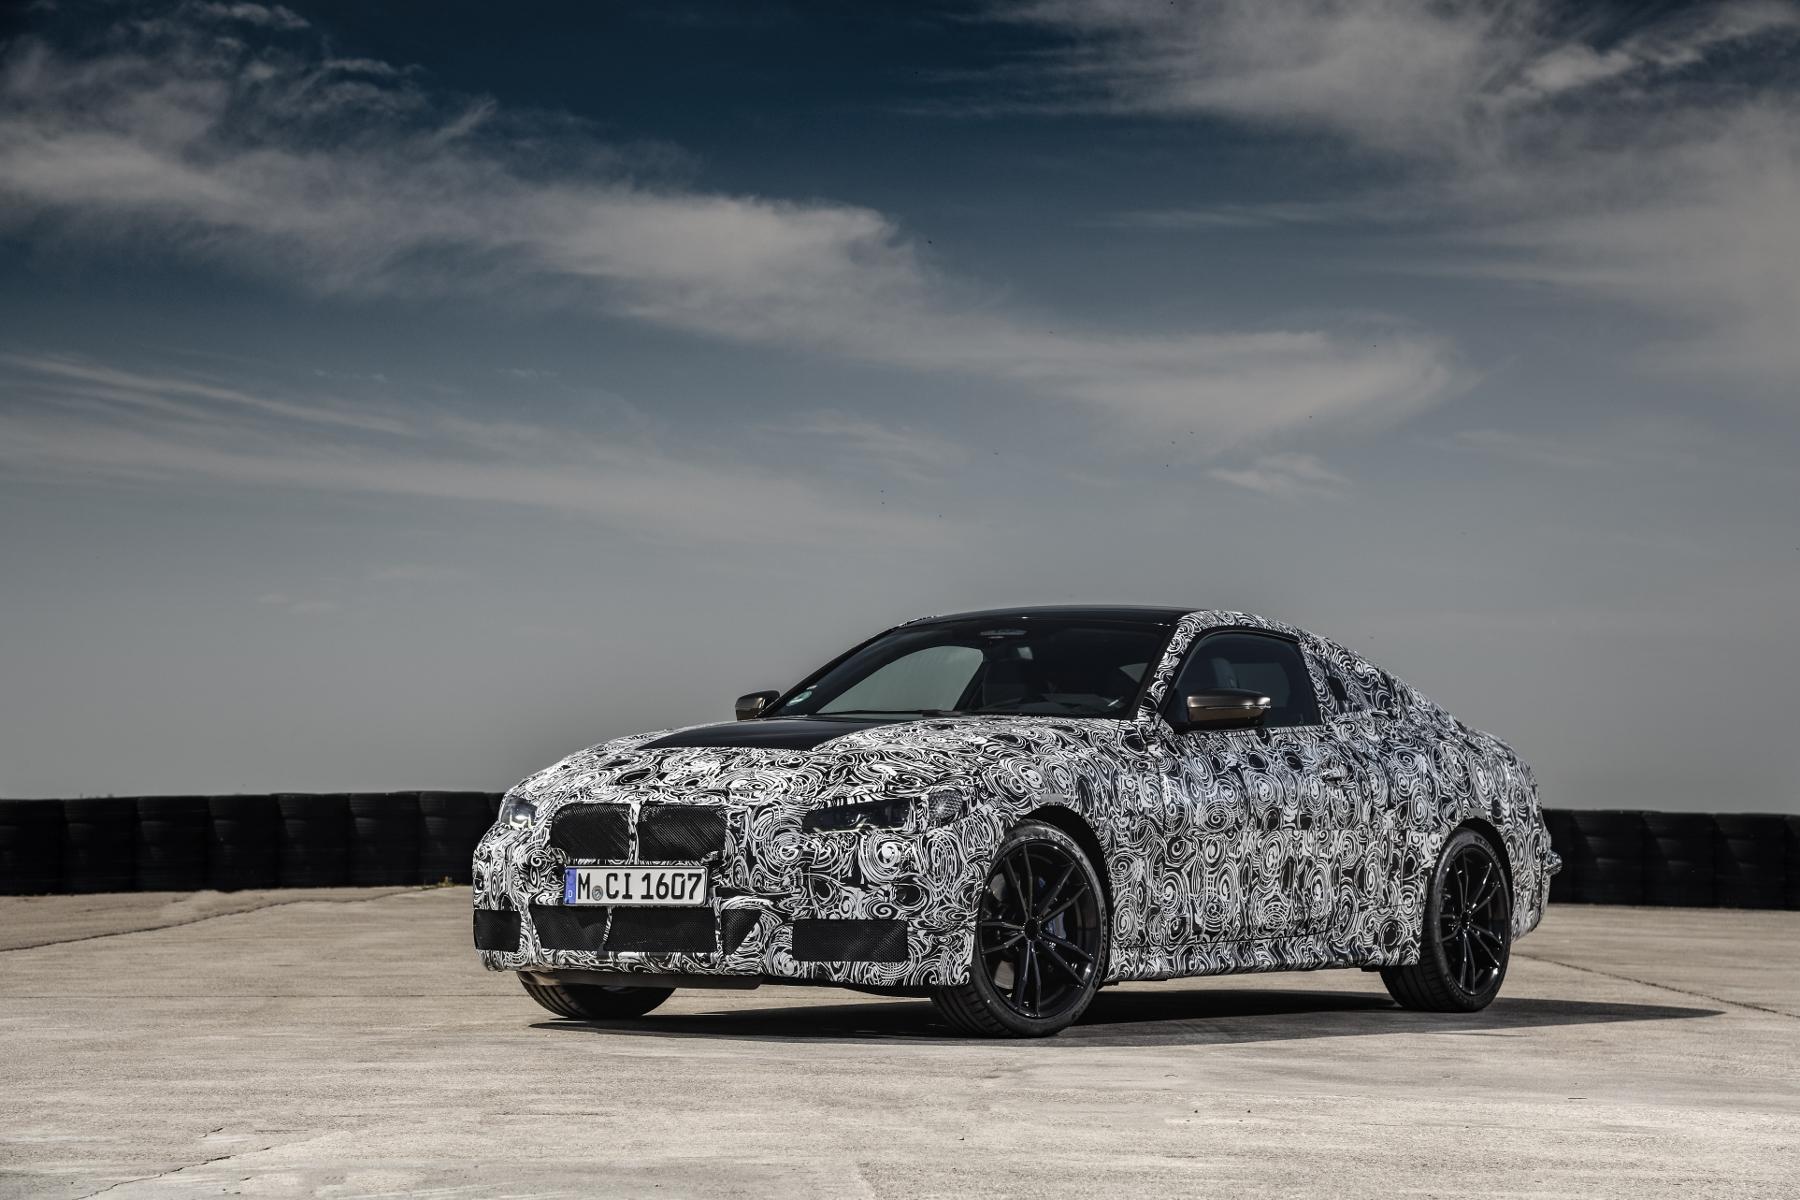 Nové BMW radu 4 Coupé dostane športovejší podvozok lqGzk3O8xN bmw-4-coupe-15